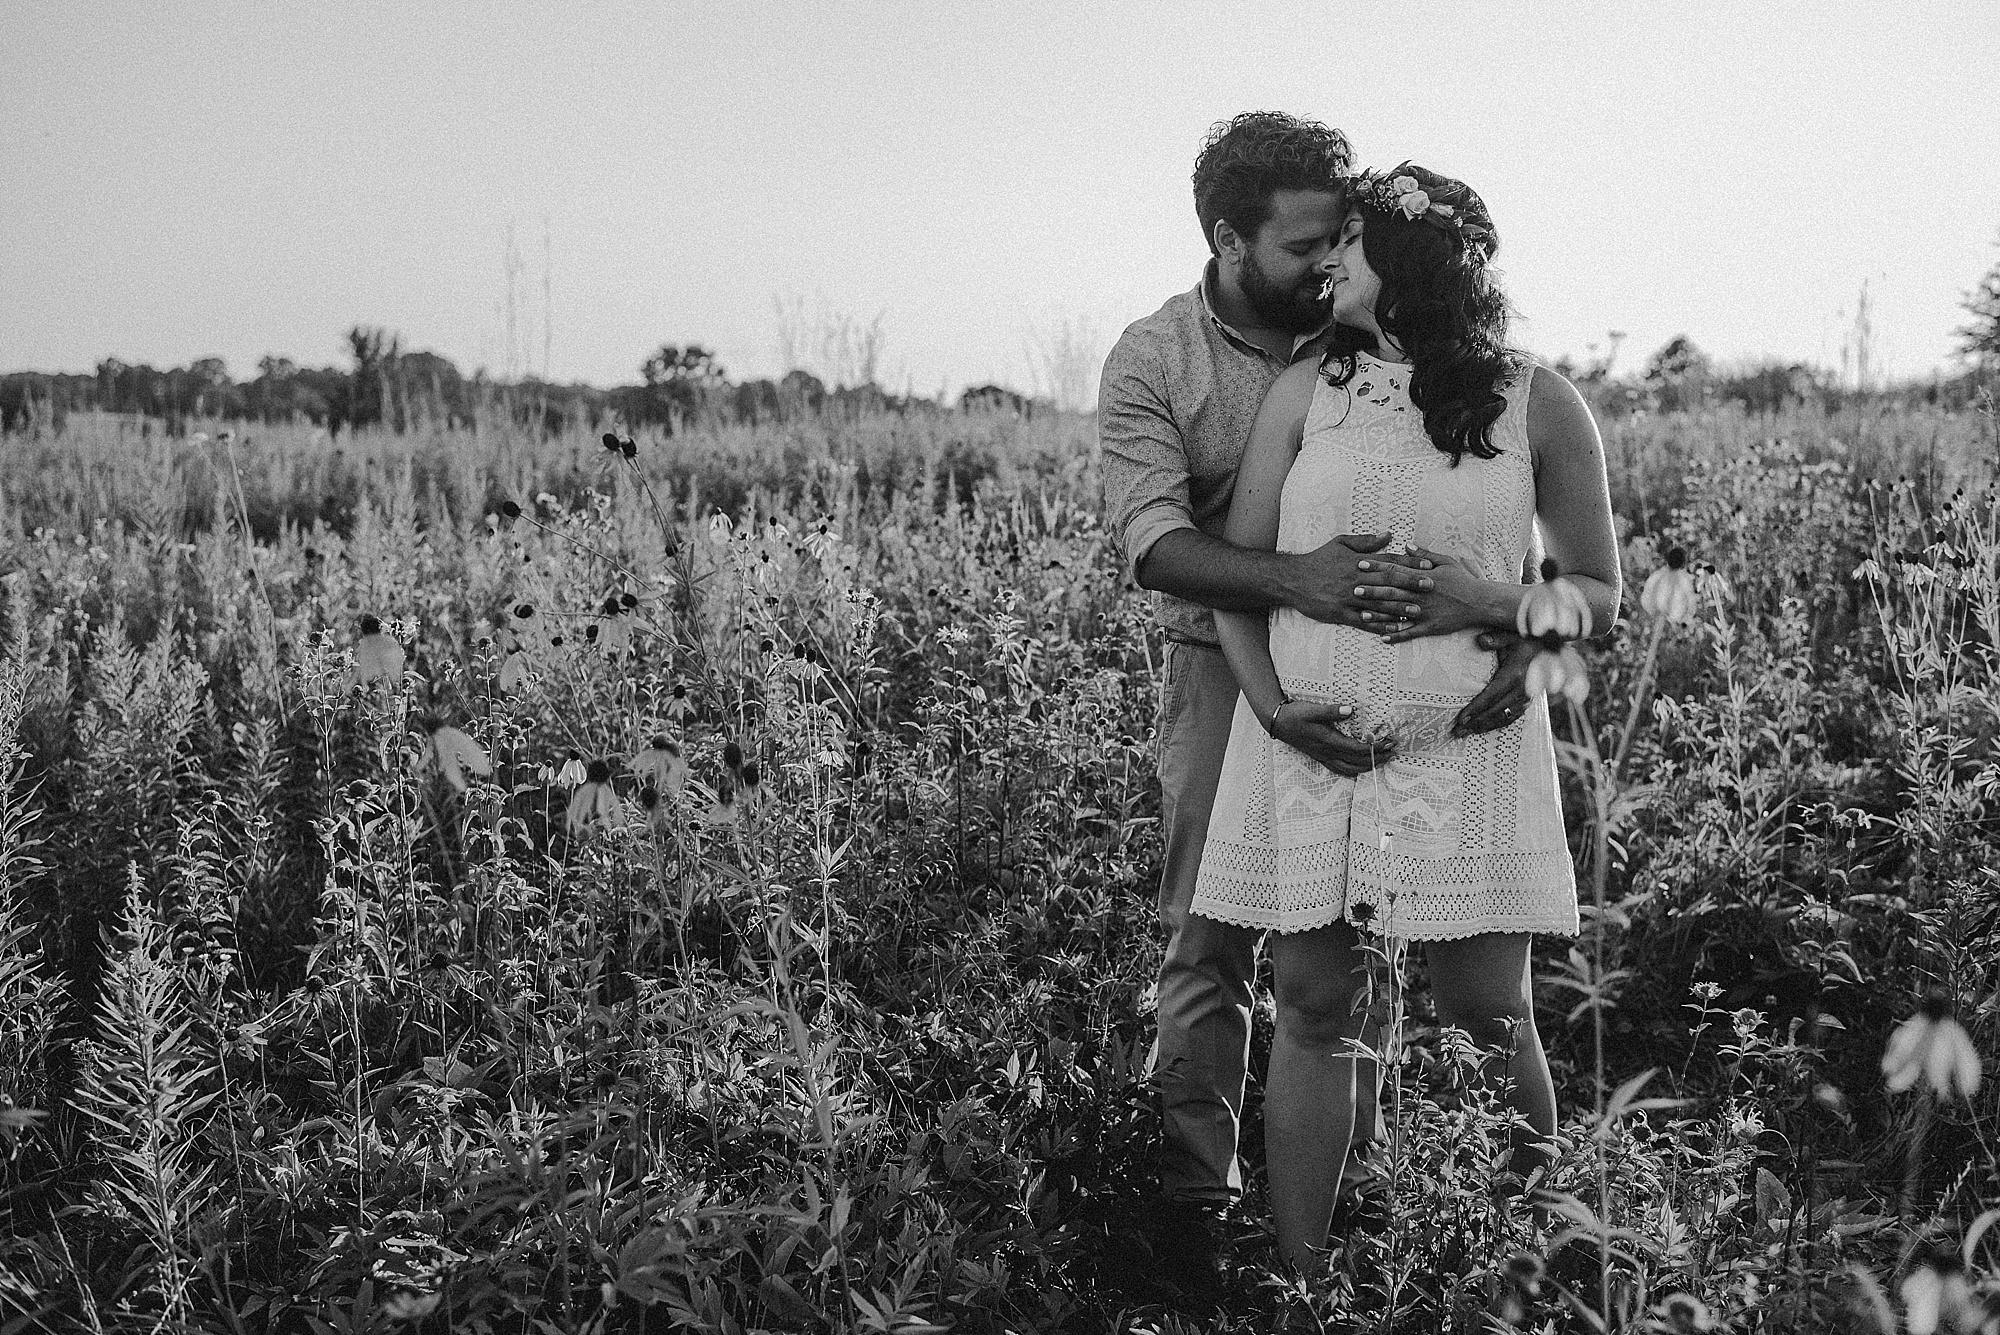 lauren-grayson-photography-cleveland-ohio-photographer-maternity-summer-outdoor-bohemian-fields-session_0507.jpg